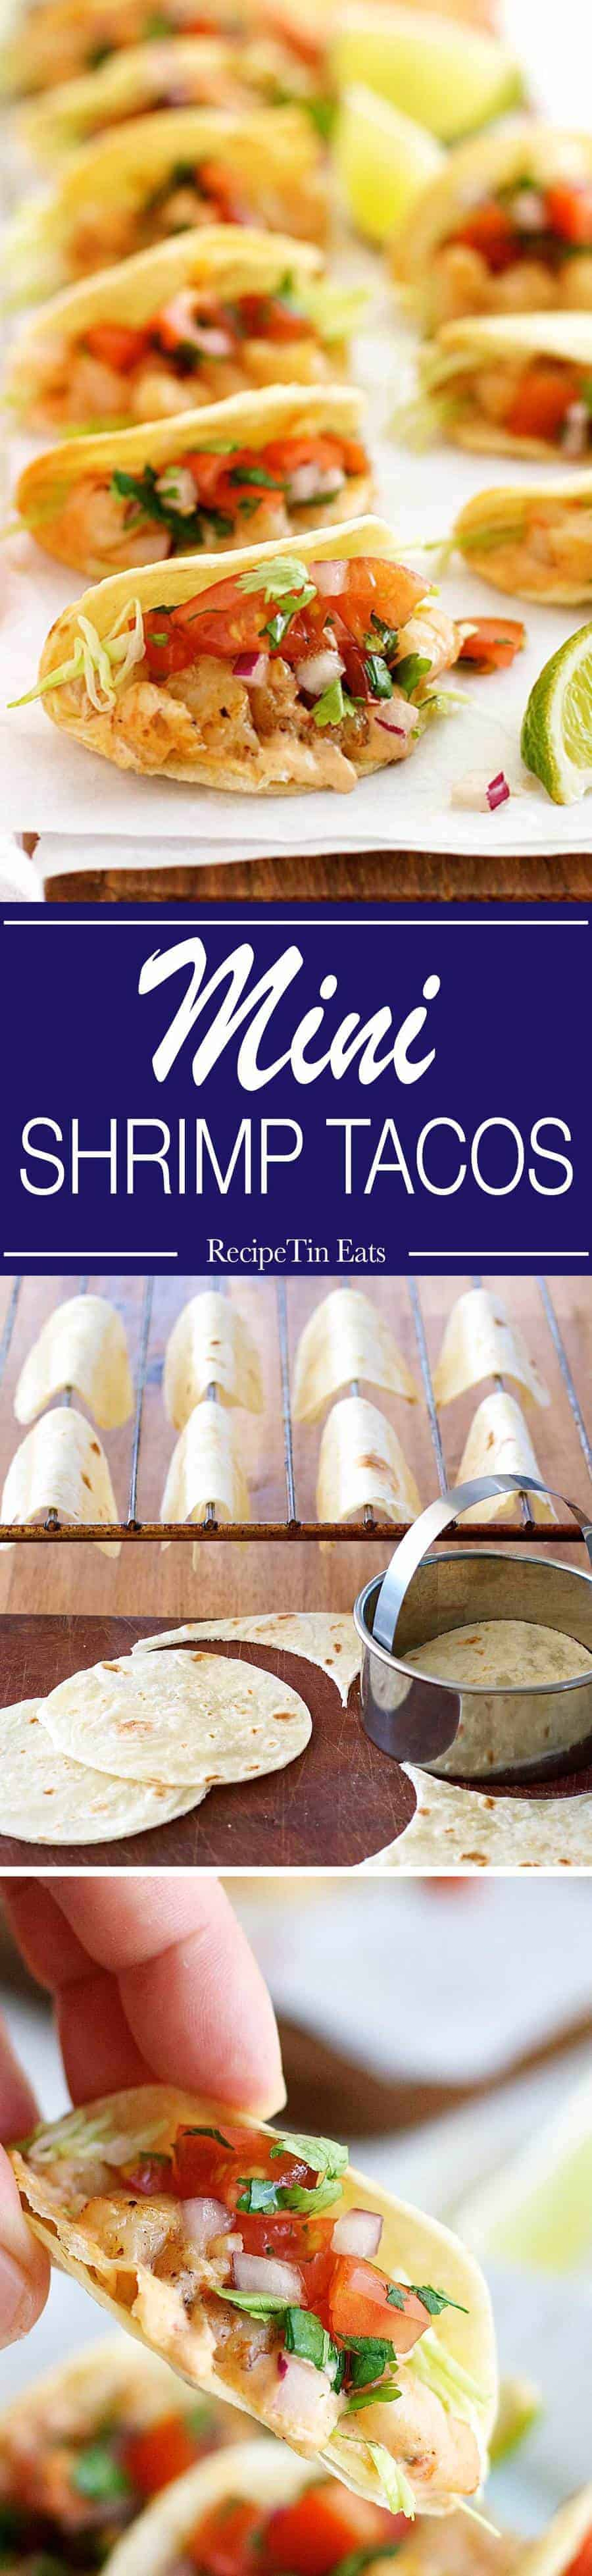 Prawn / Shrimp Taco Appetizers